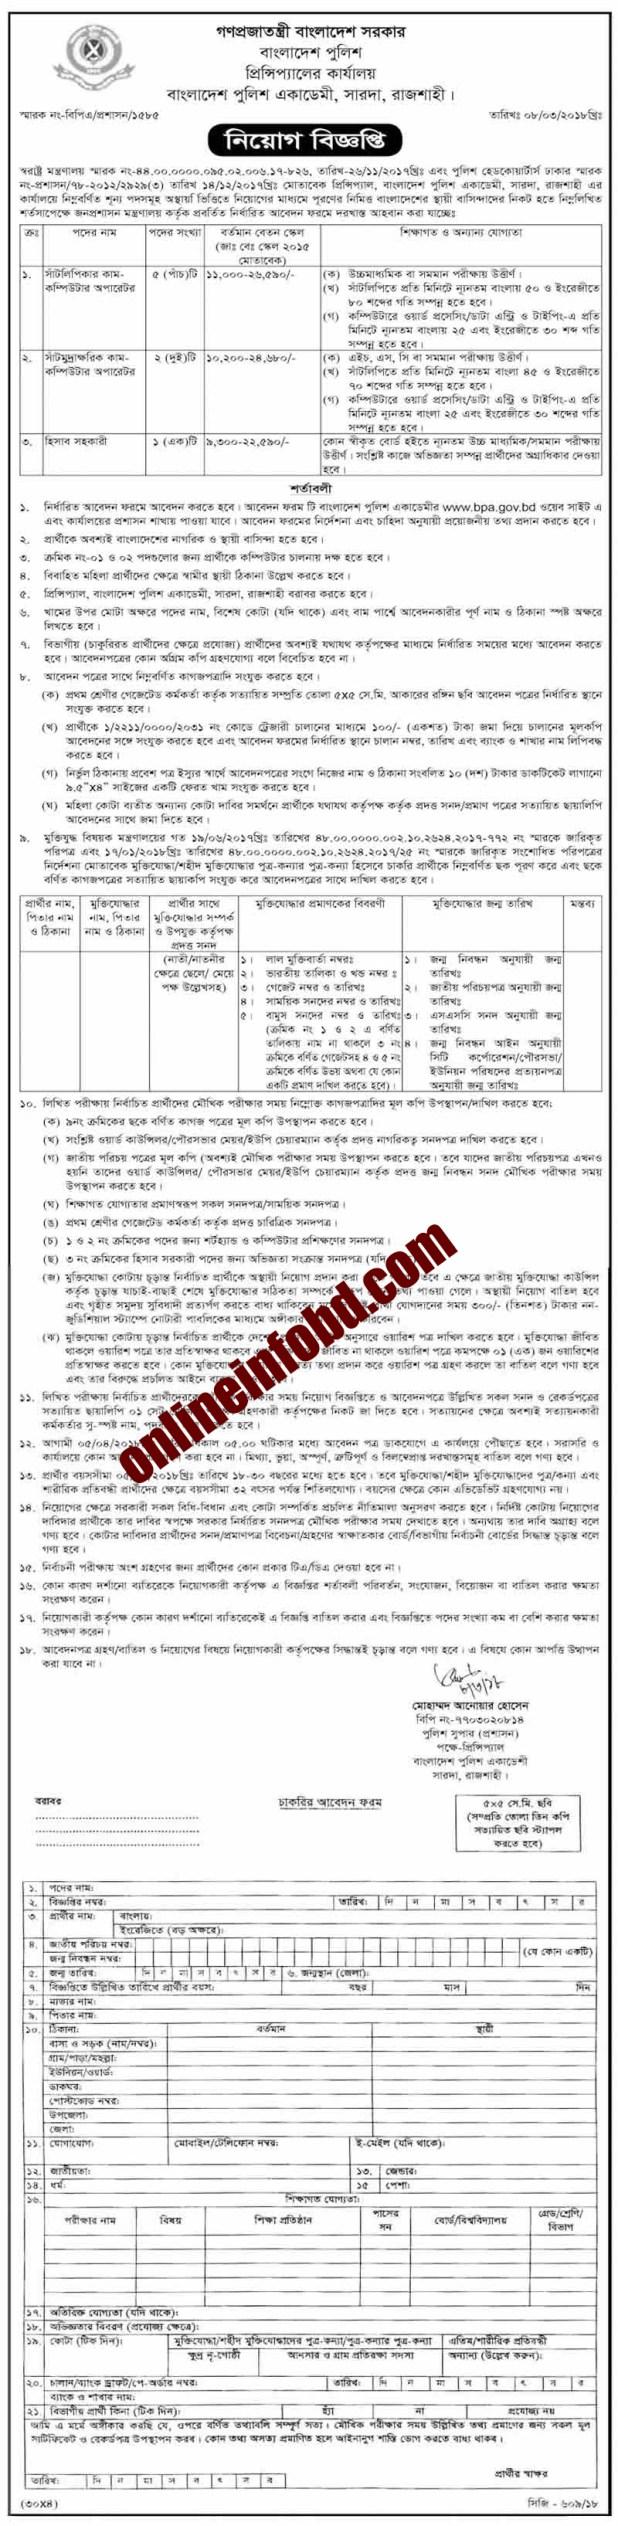 Bangladesh Police job vacancy 2018 www.police.gov.bd